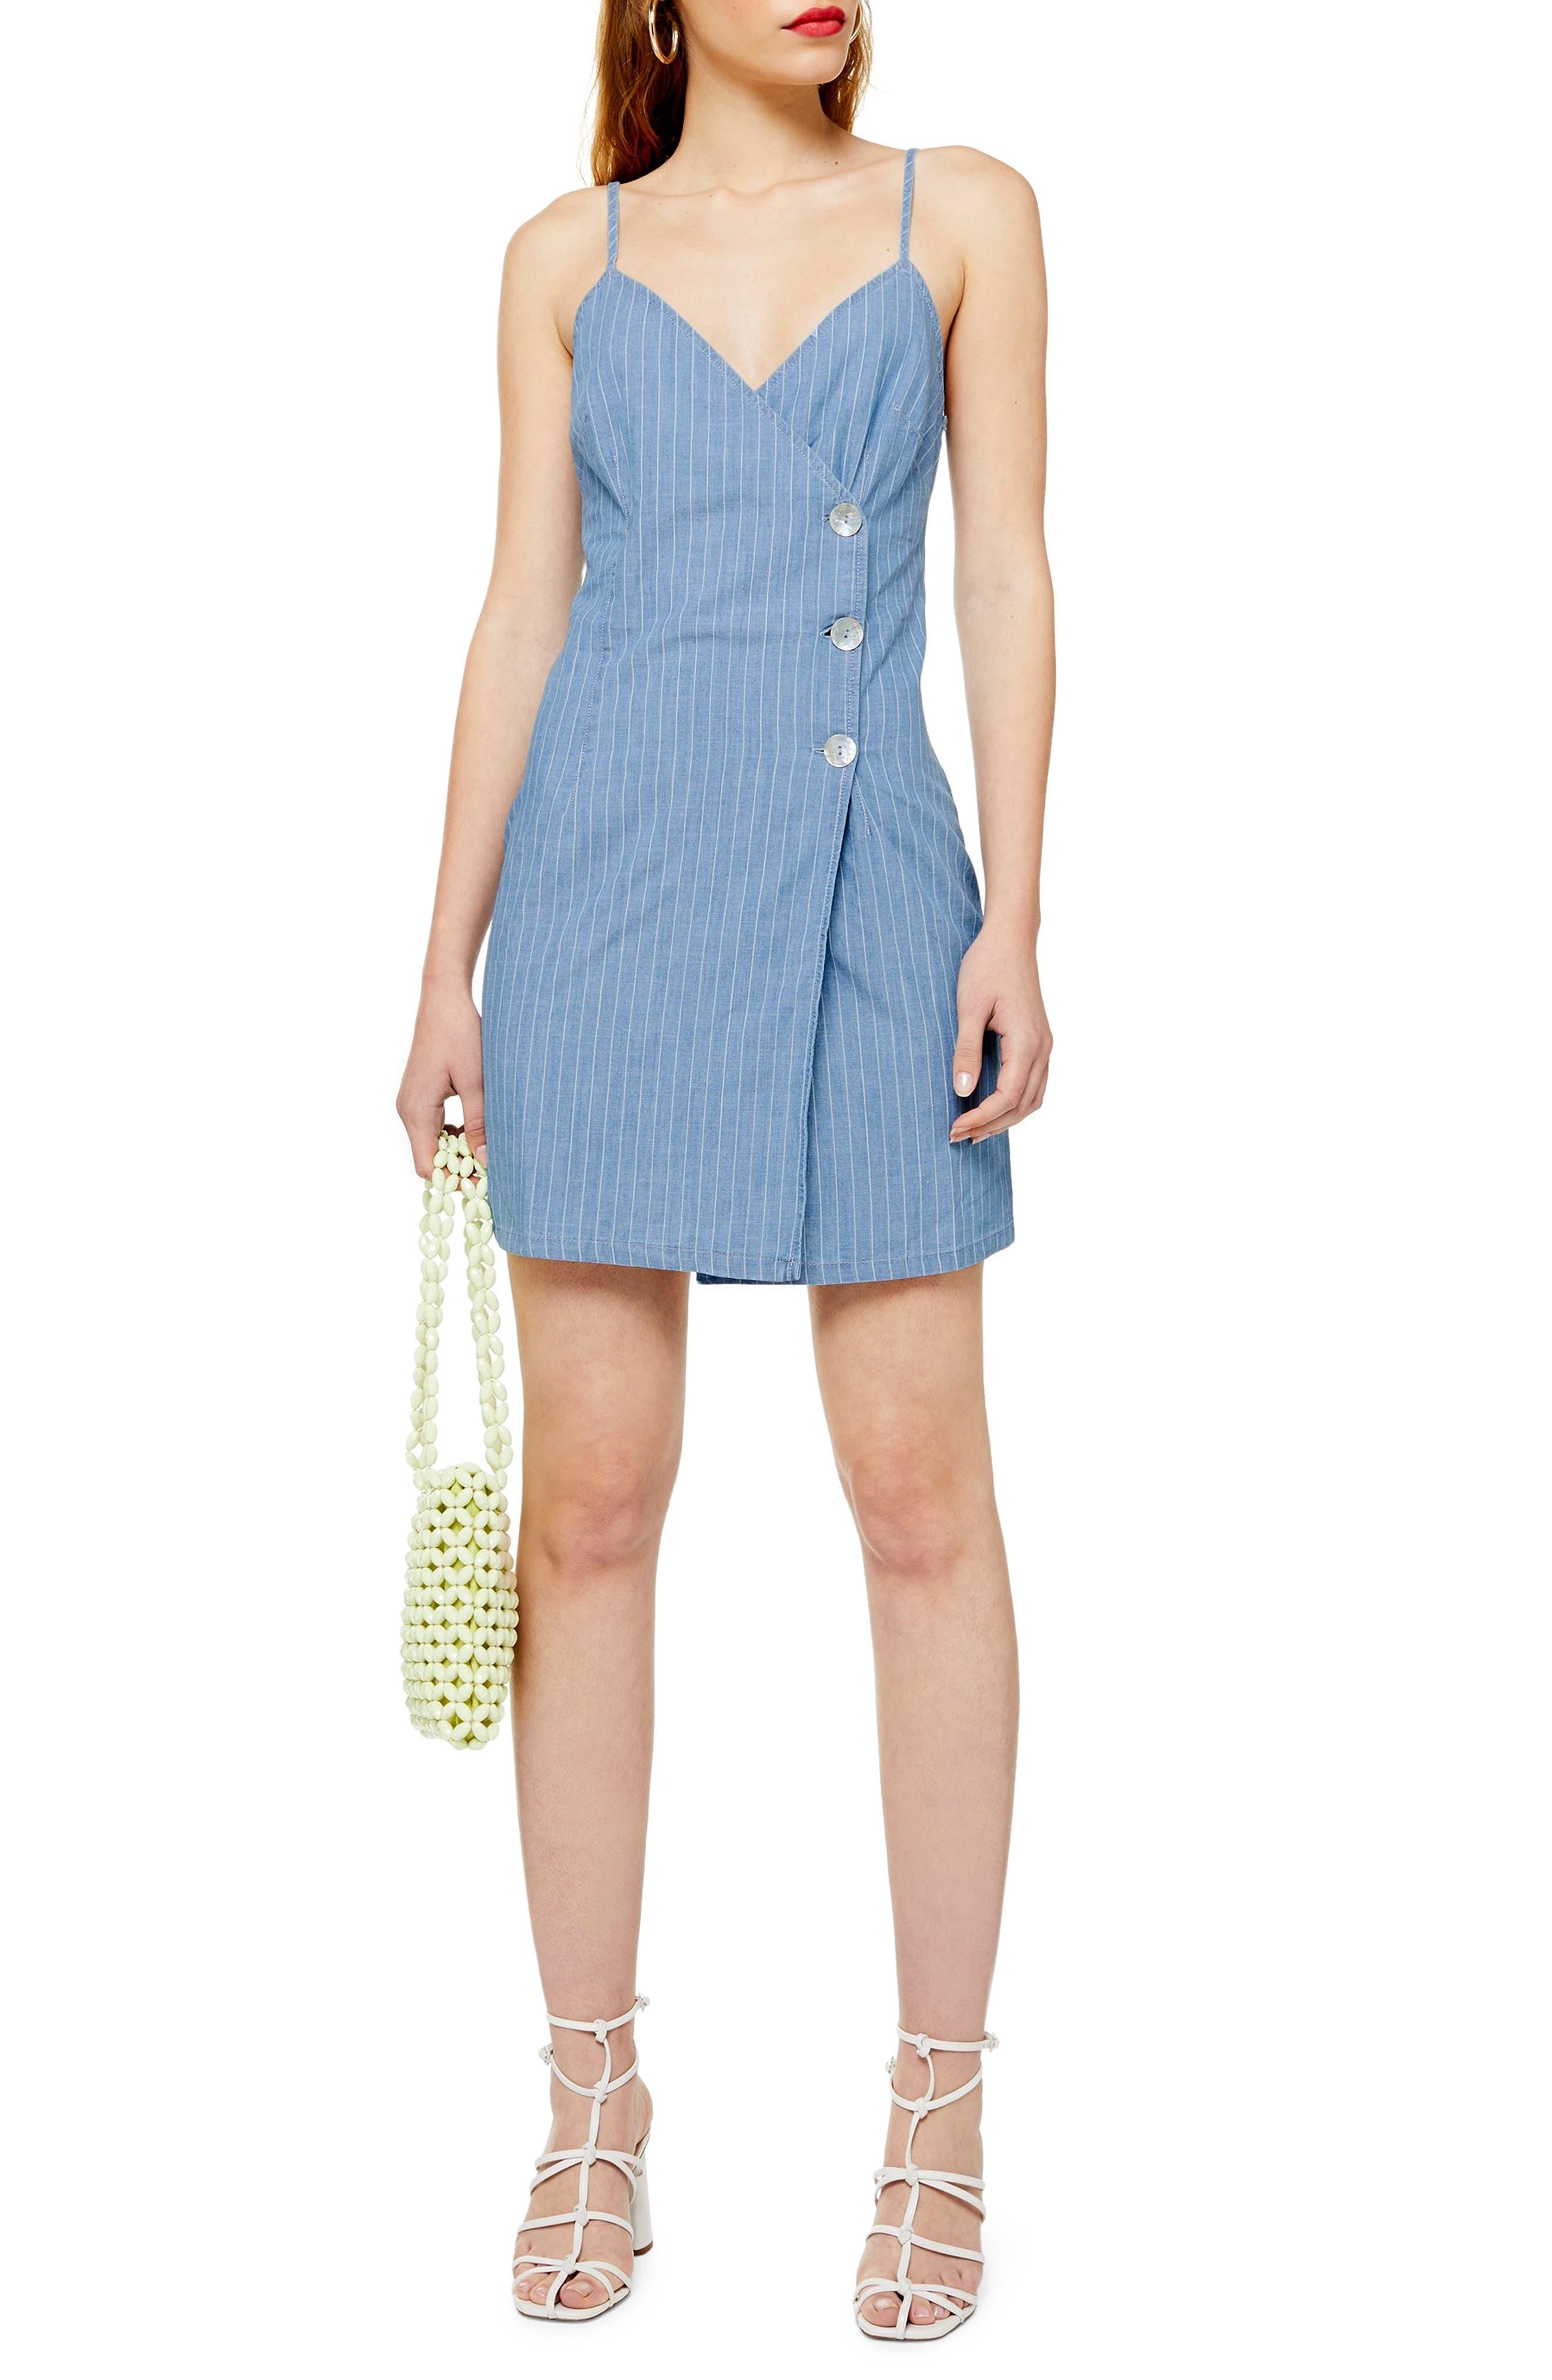 Topshop Stripe Denim Wrap Minidress, US (fits like 0-2) - Blue